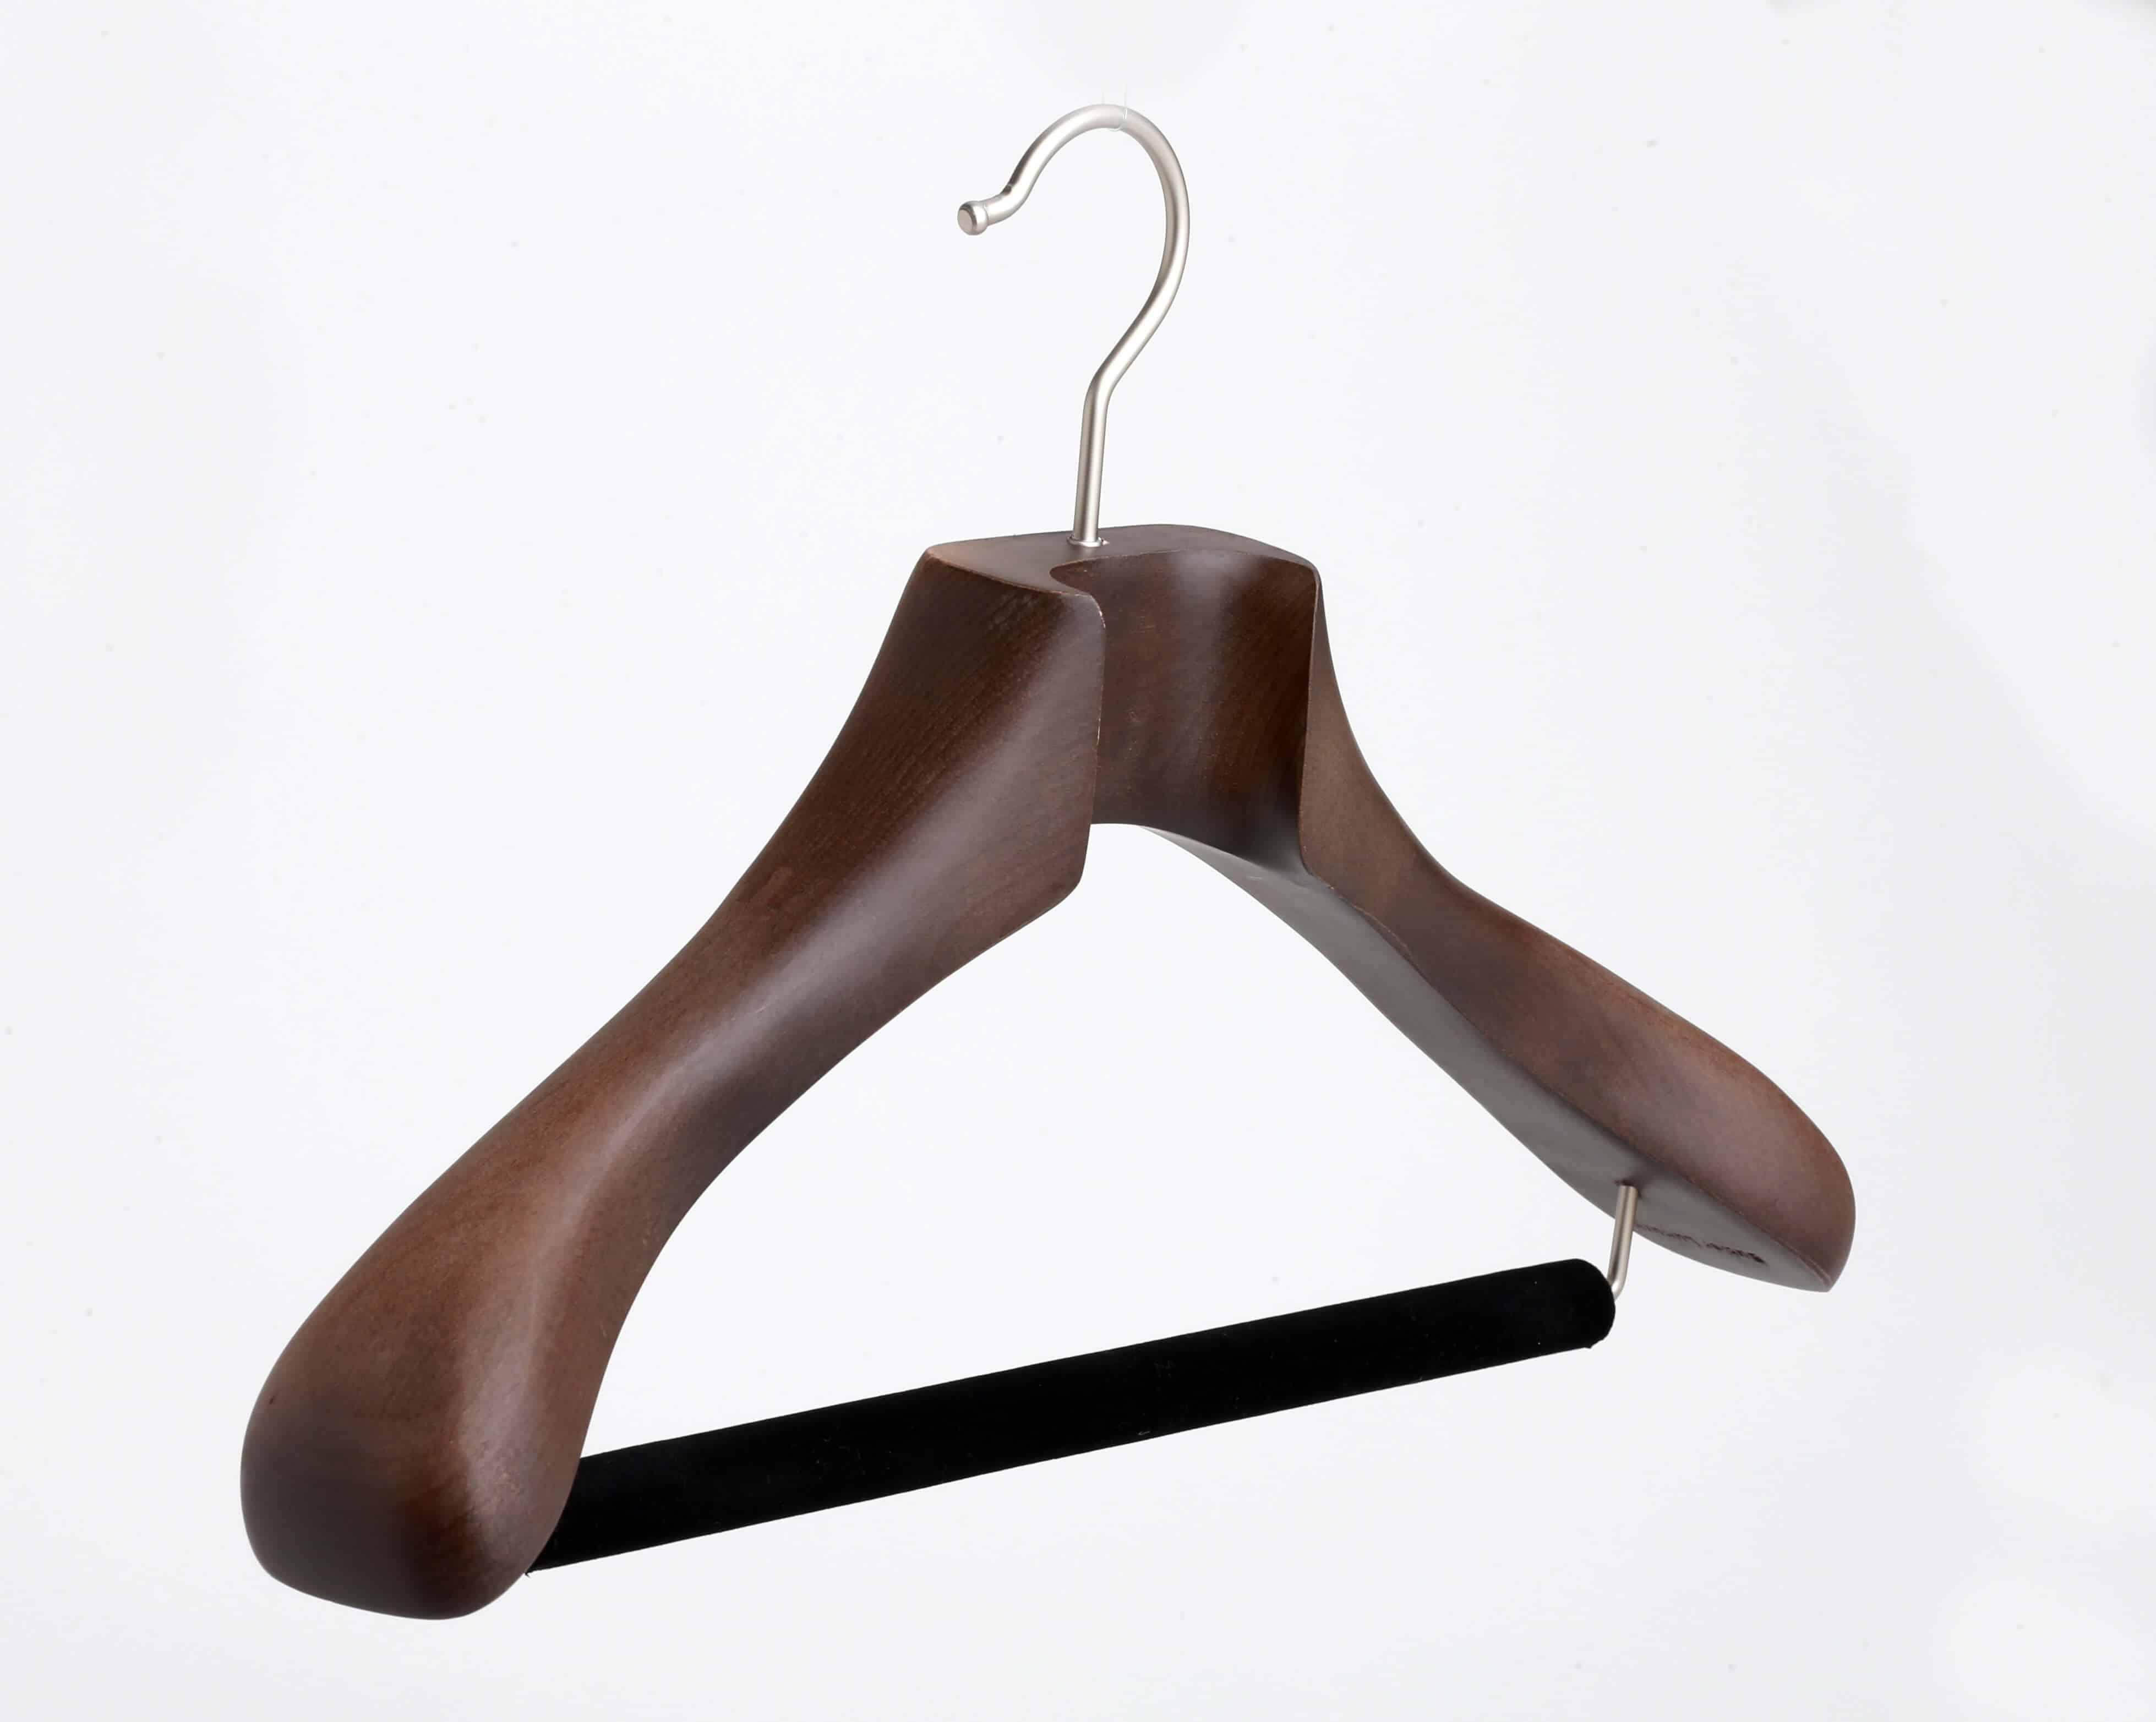 The Best Clothes Hanger In The World? — Gentleman's Gazette